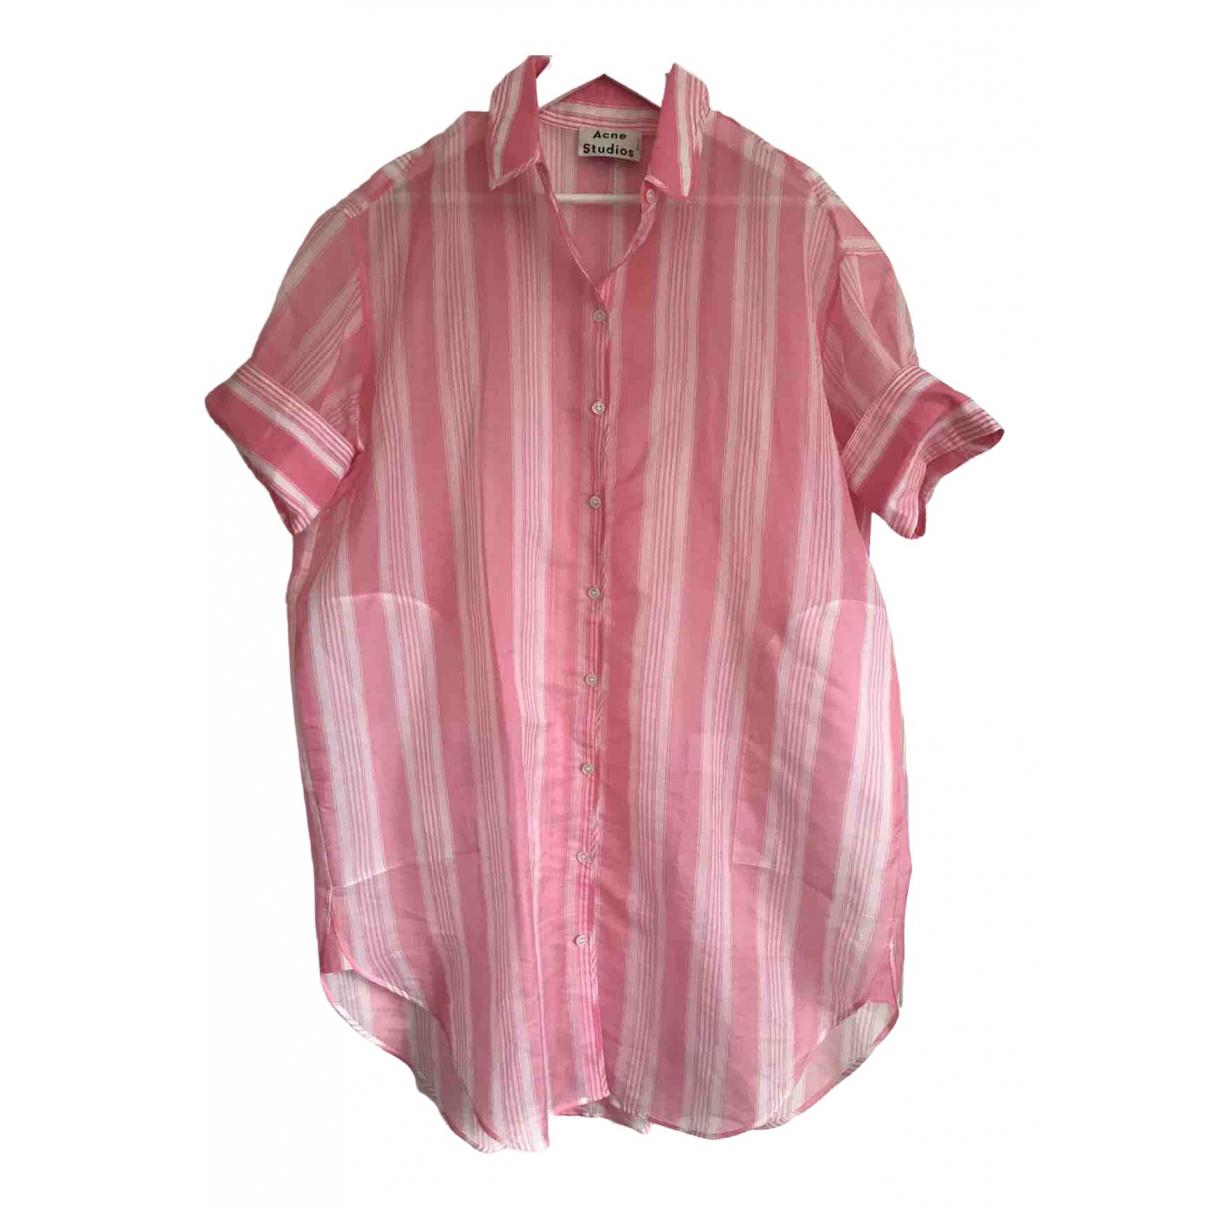 Acne Studios \N Pink dress for Women 8 UK